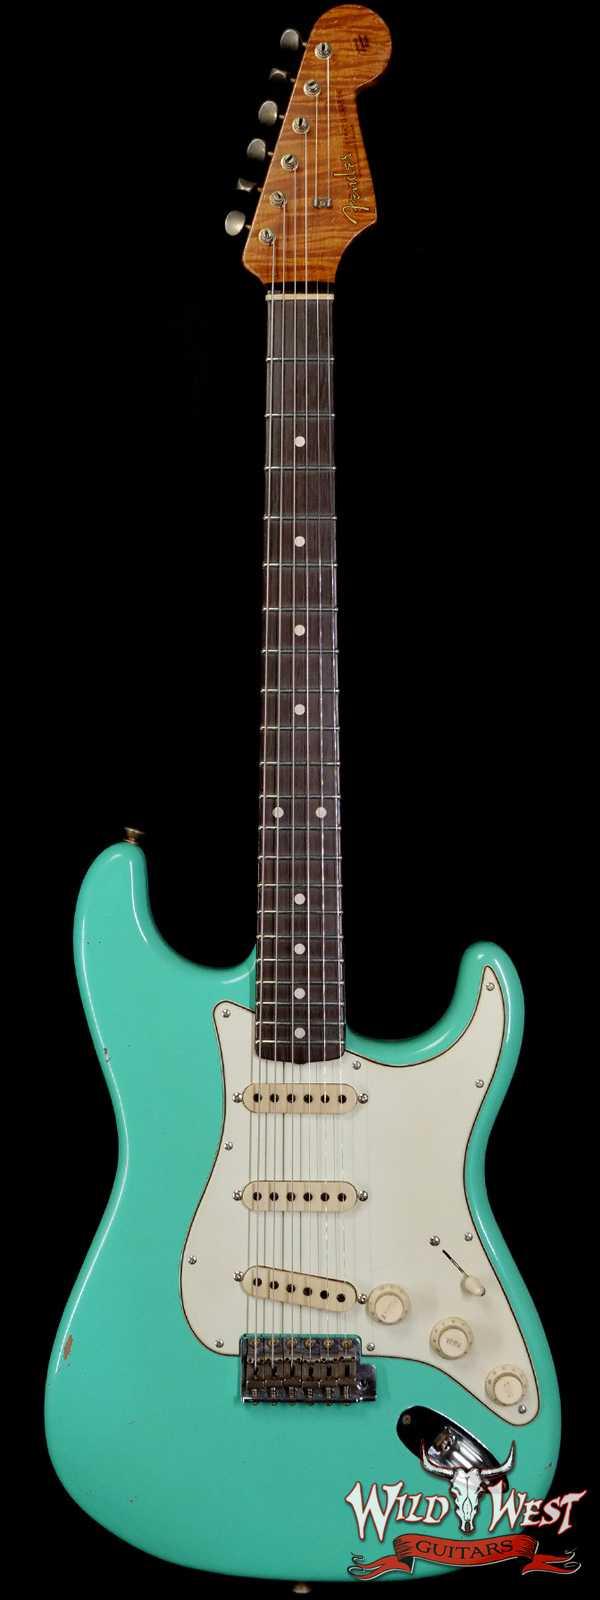 Fender Custom Shop Dennis Galuszka Masterbuilt Roasted 1959 Stratocaster Journeyman Relic Brazilian Rosewood Slab Board Hand-Wound Pickups Aged Surf Green